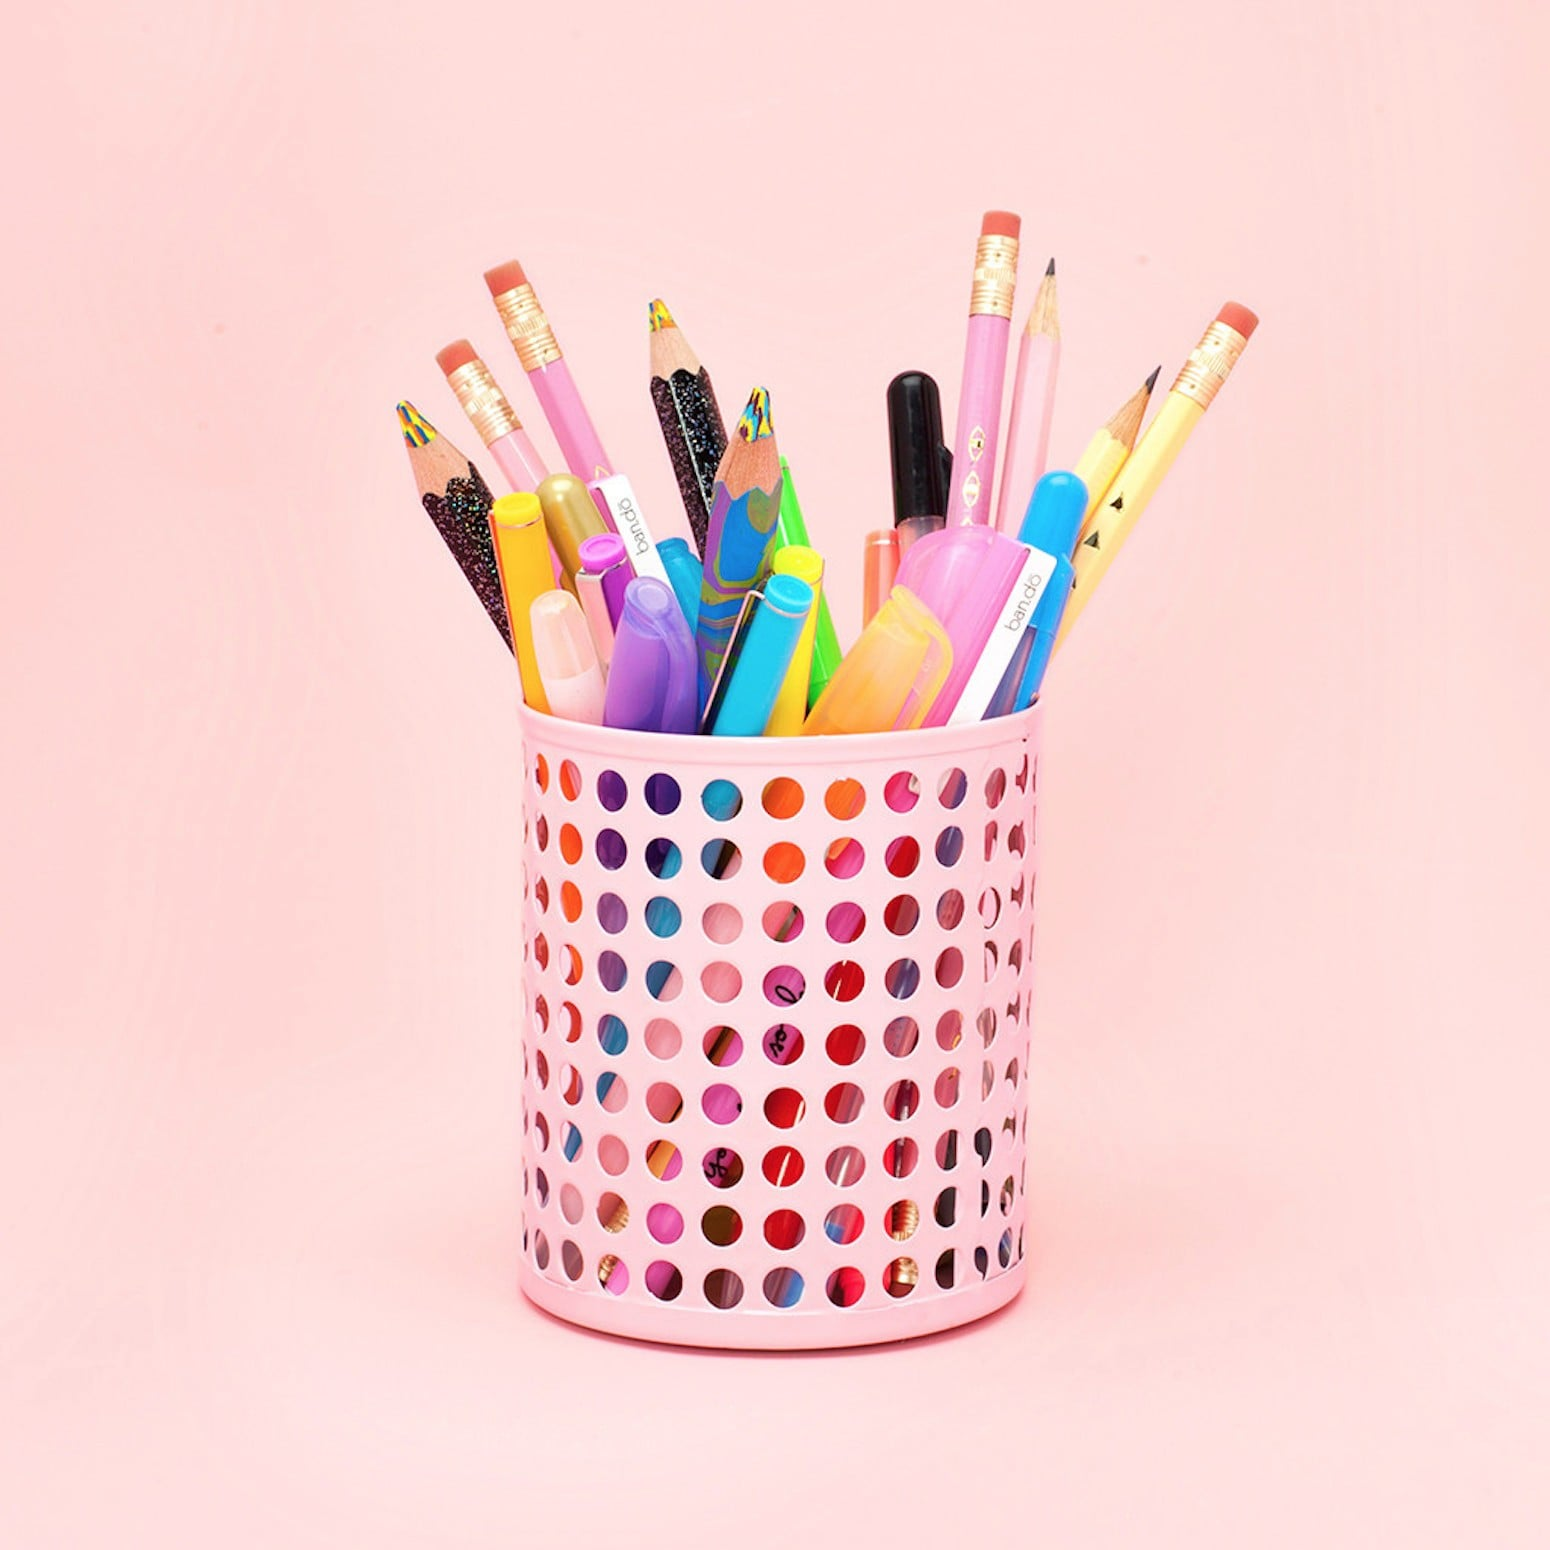 pencil holder pink girl office baby decor accessories room organizer gift blush pin desk